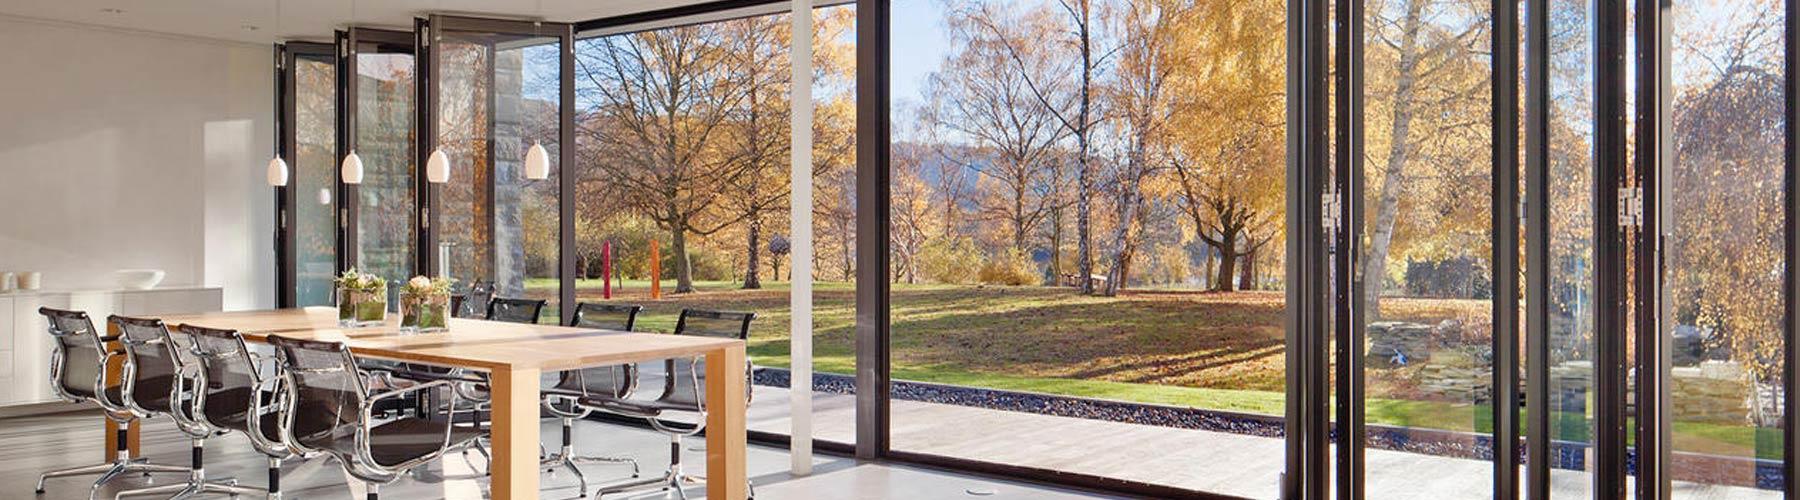 Solarlux® Aluminium Bi-folding Doors & SOLARLUX® Aluminium Bi Fold Doors | Bifold Doors | Bi Folding Doors ...